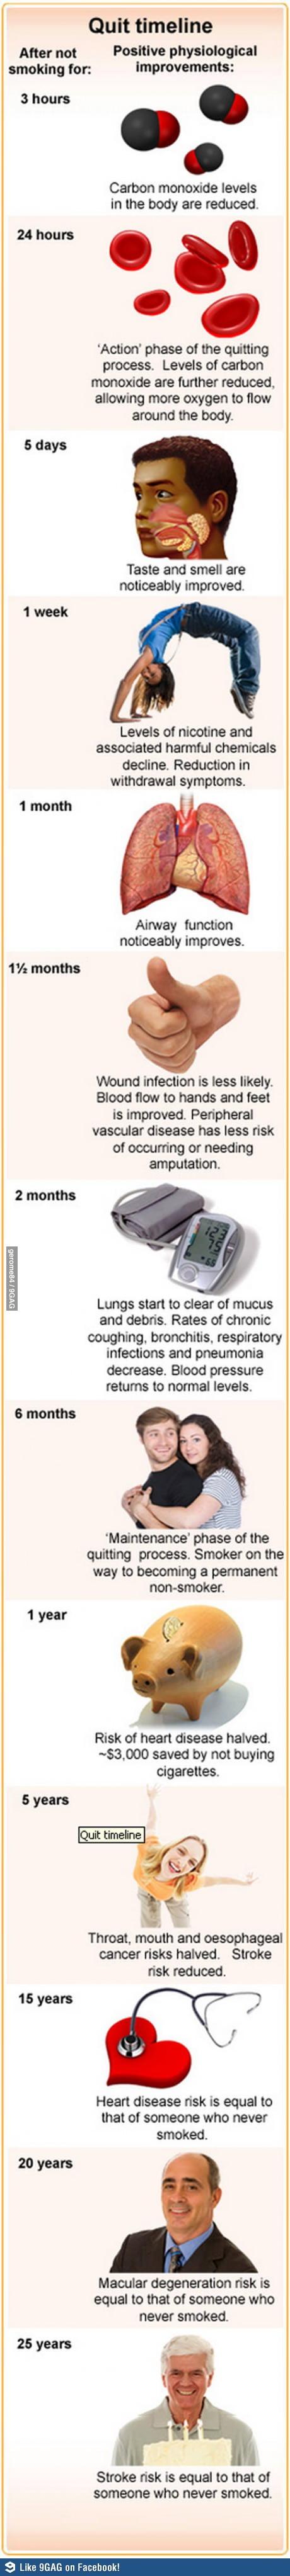 quit-smoking-timeline-5